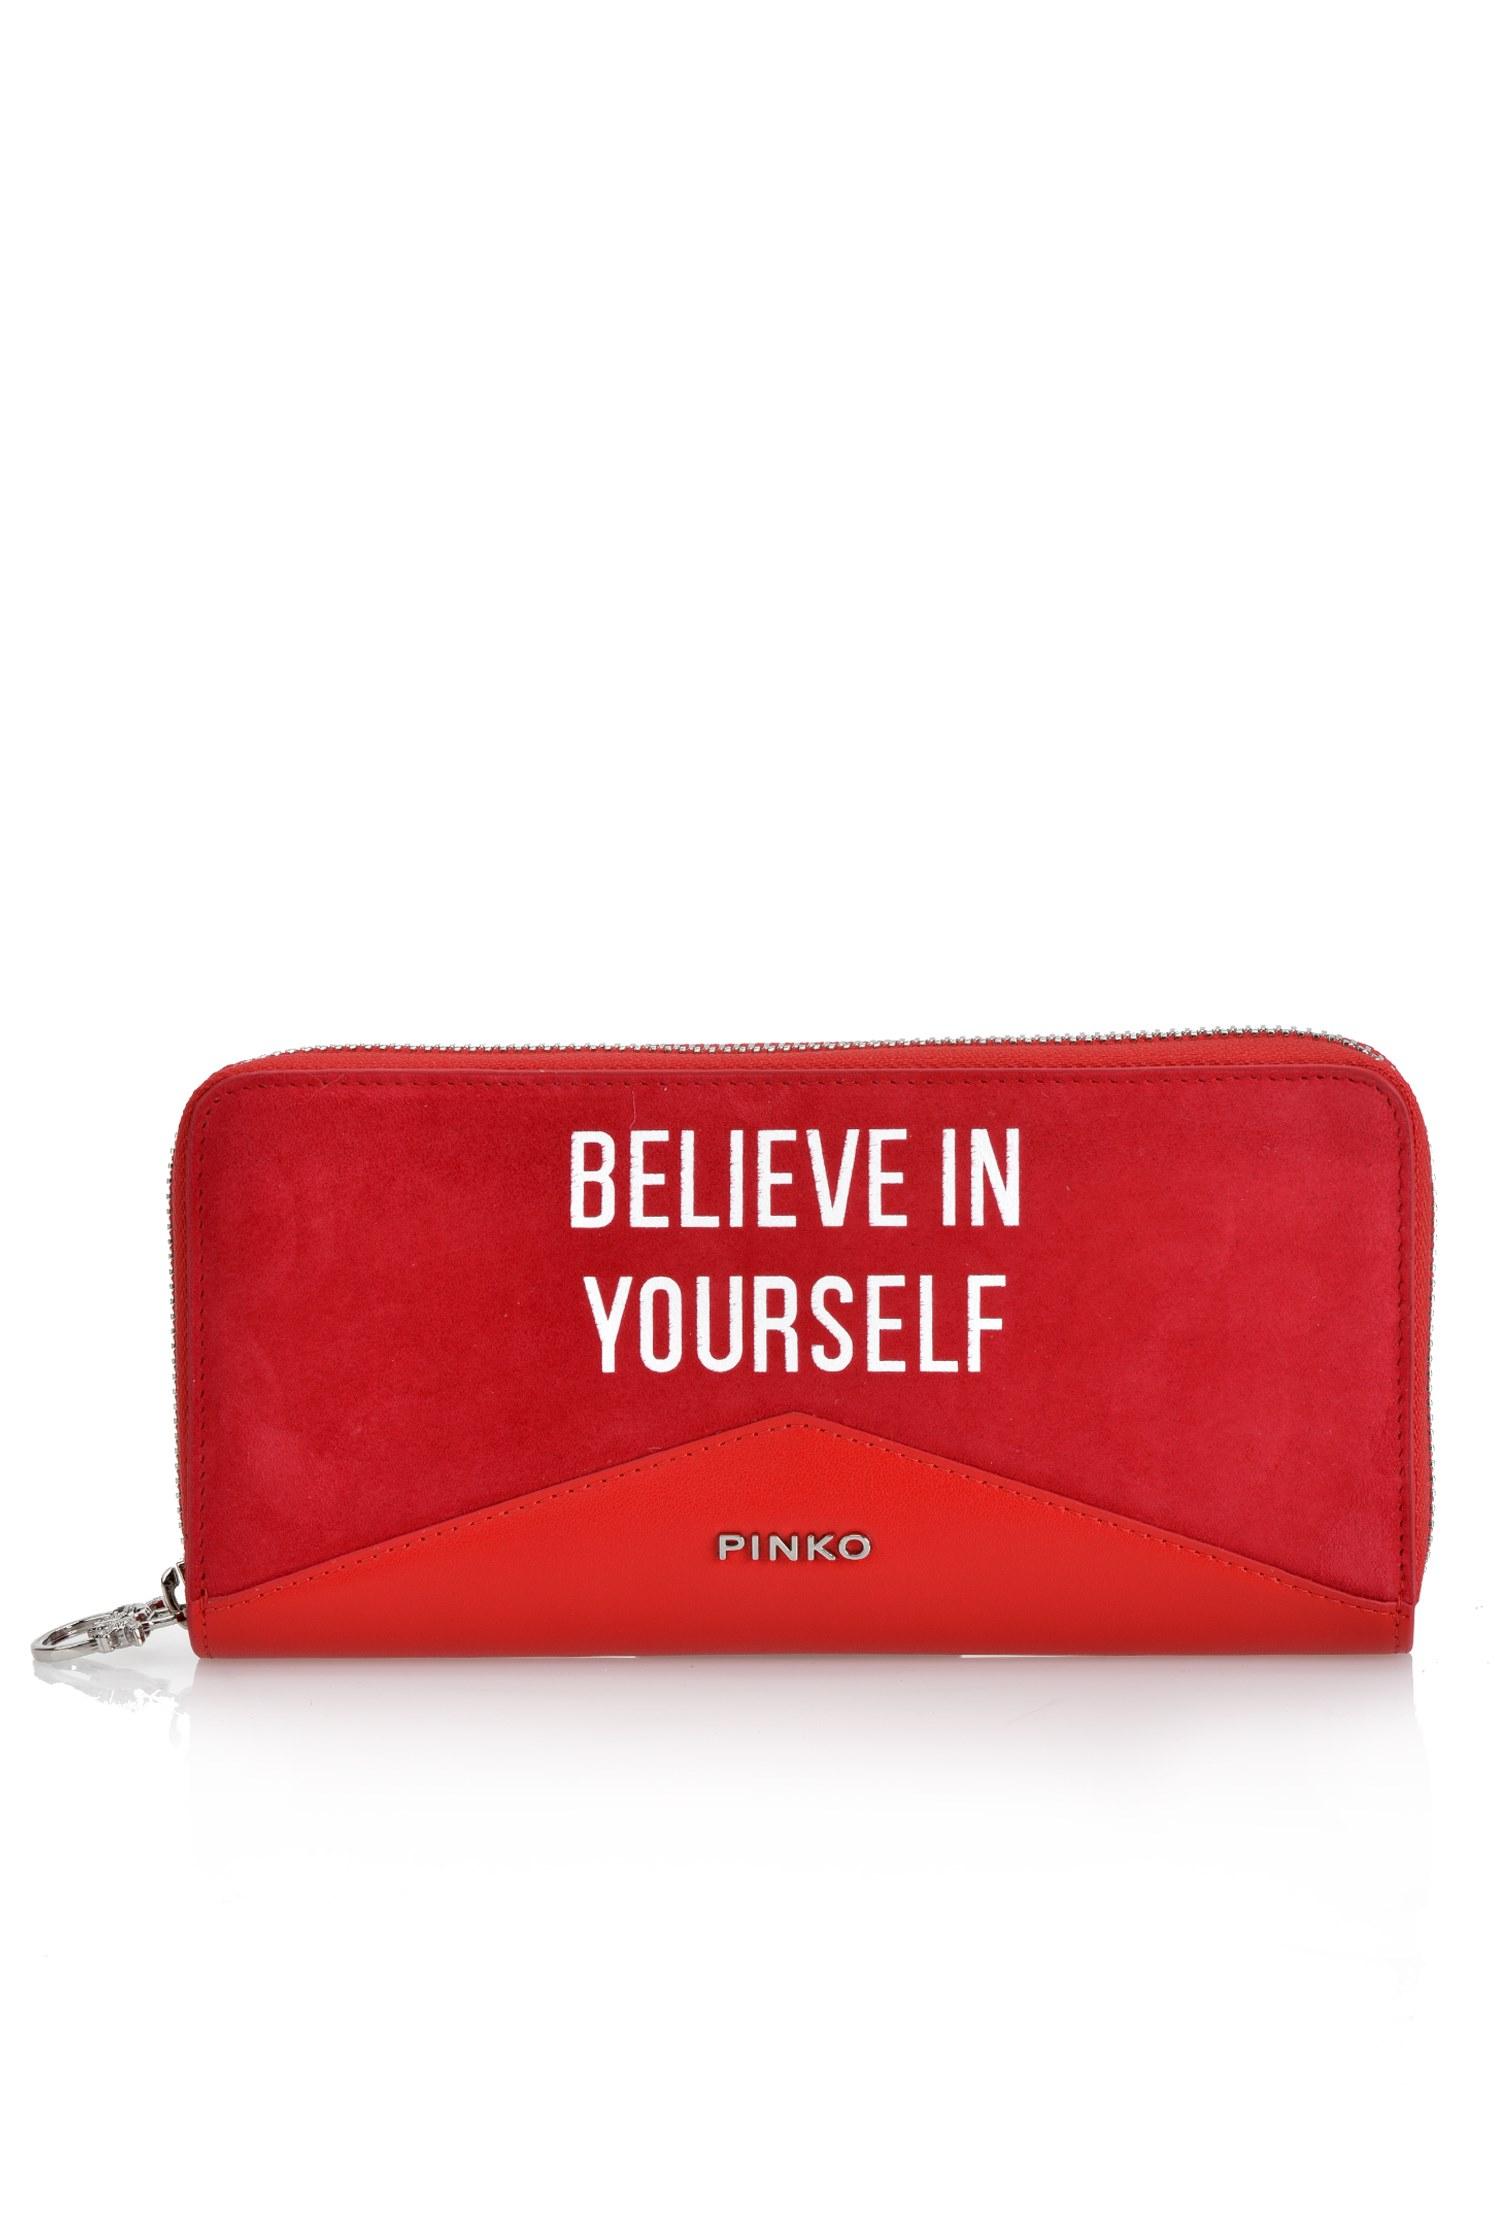 Red Ronfare wallet Pinko o8EMvKAnSt